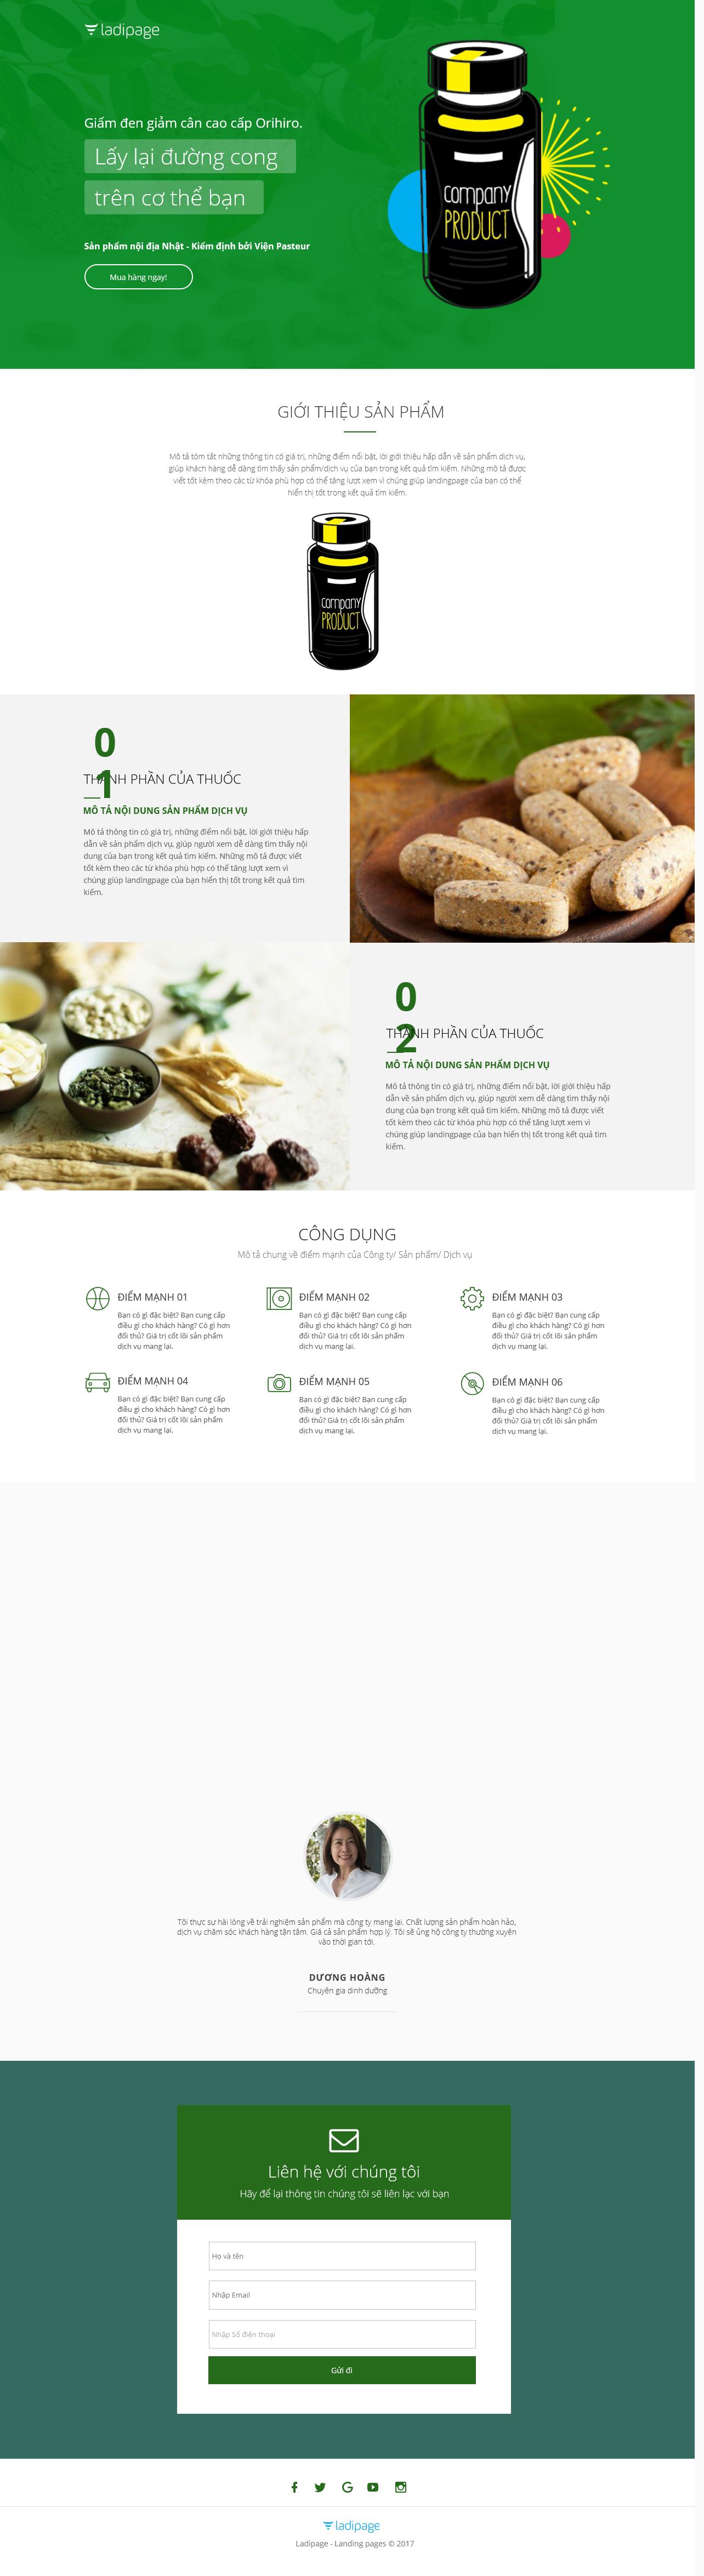 Thiết kế website Thiết kế webiste landingpage tham-my---spa---lam-dep Làm đẹp 13